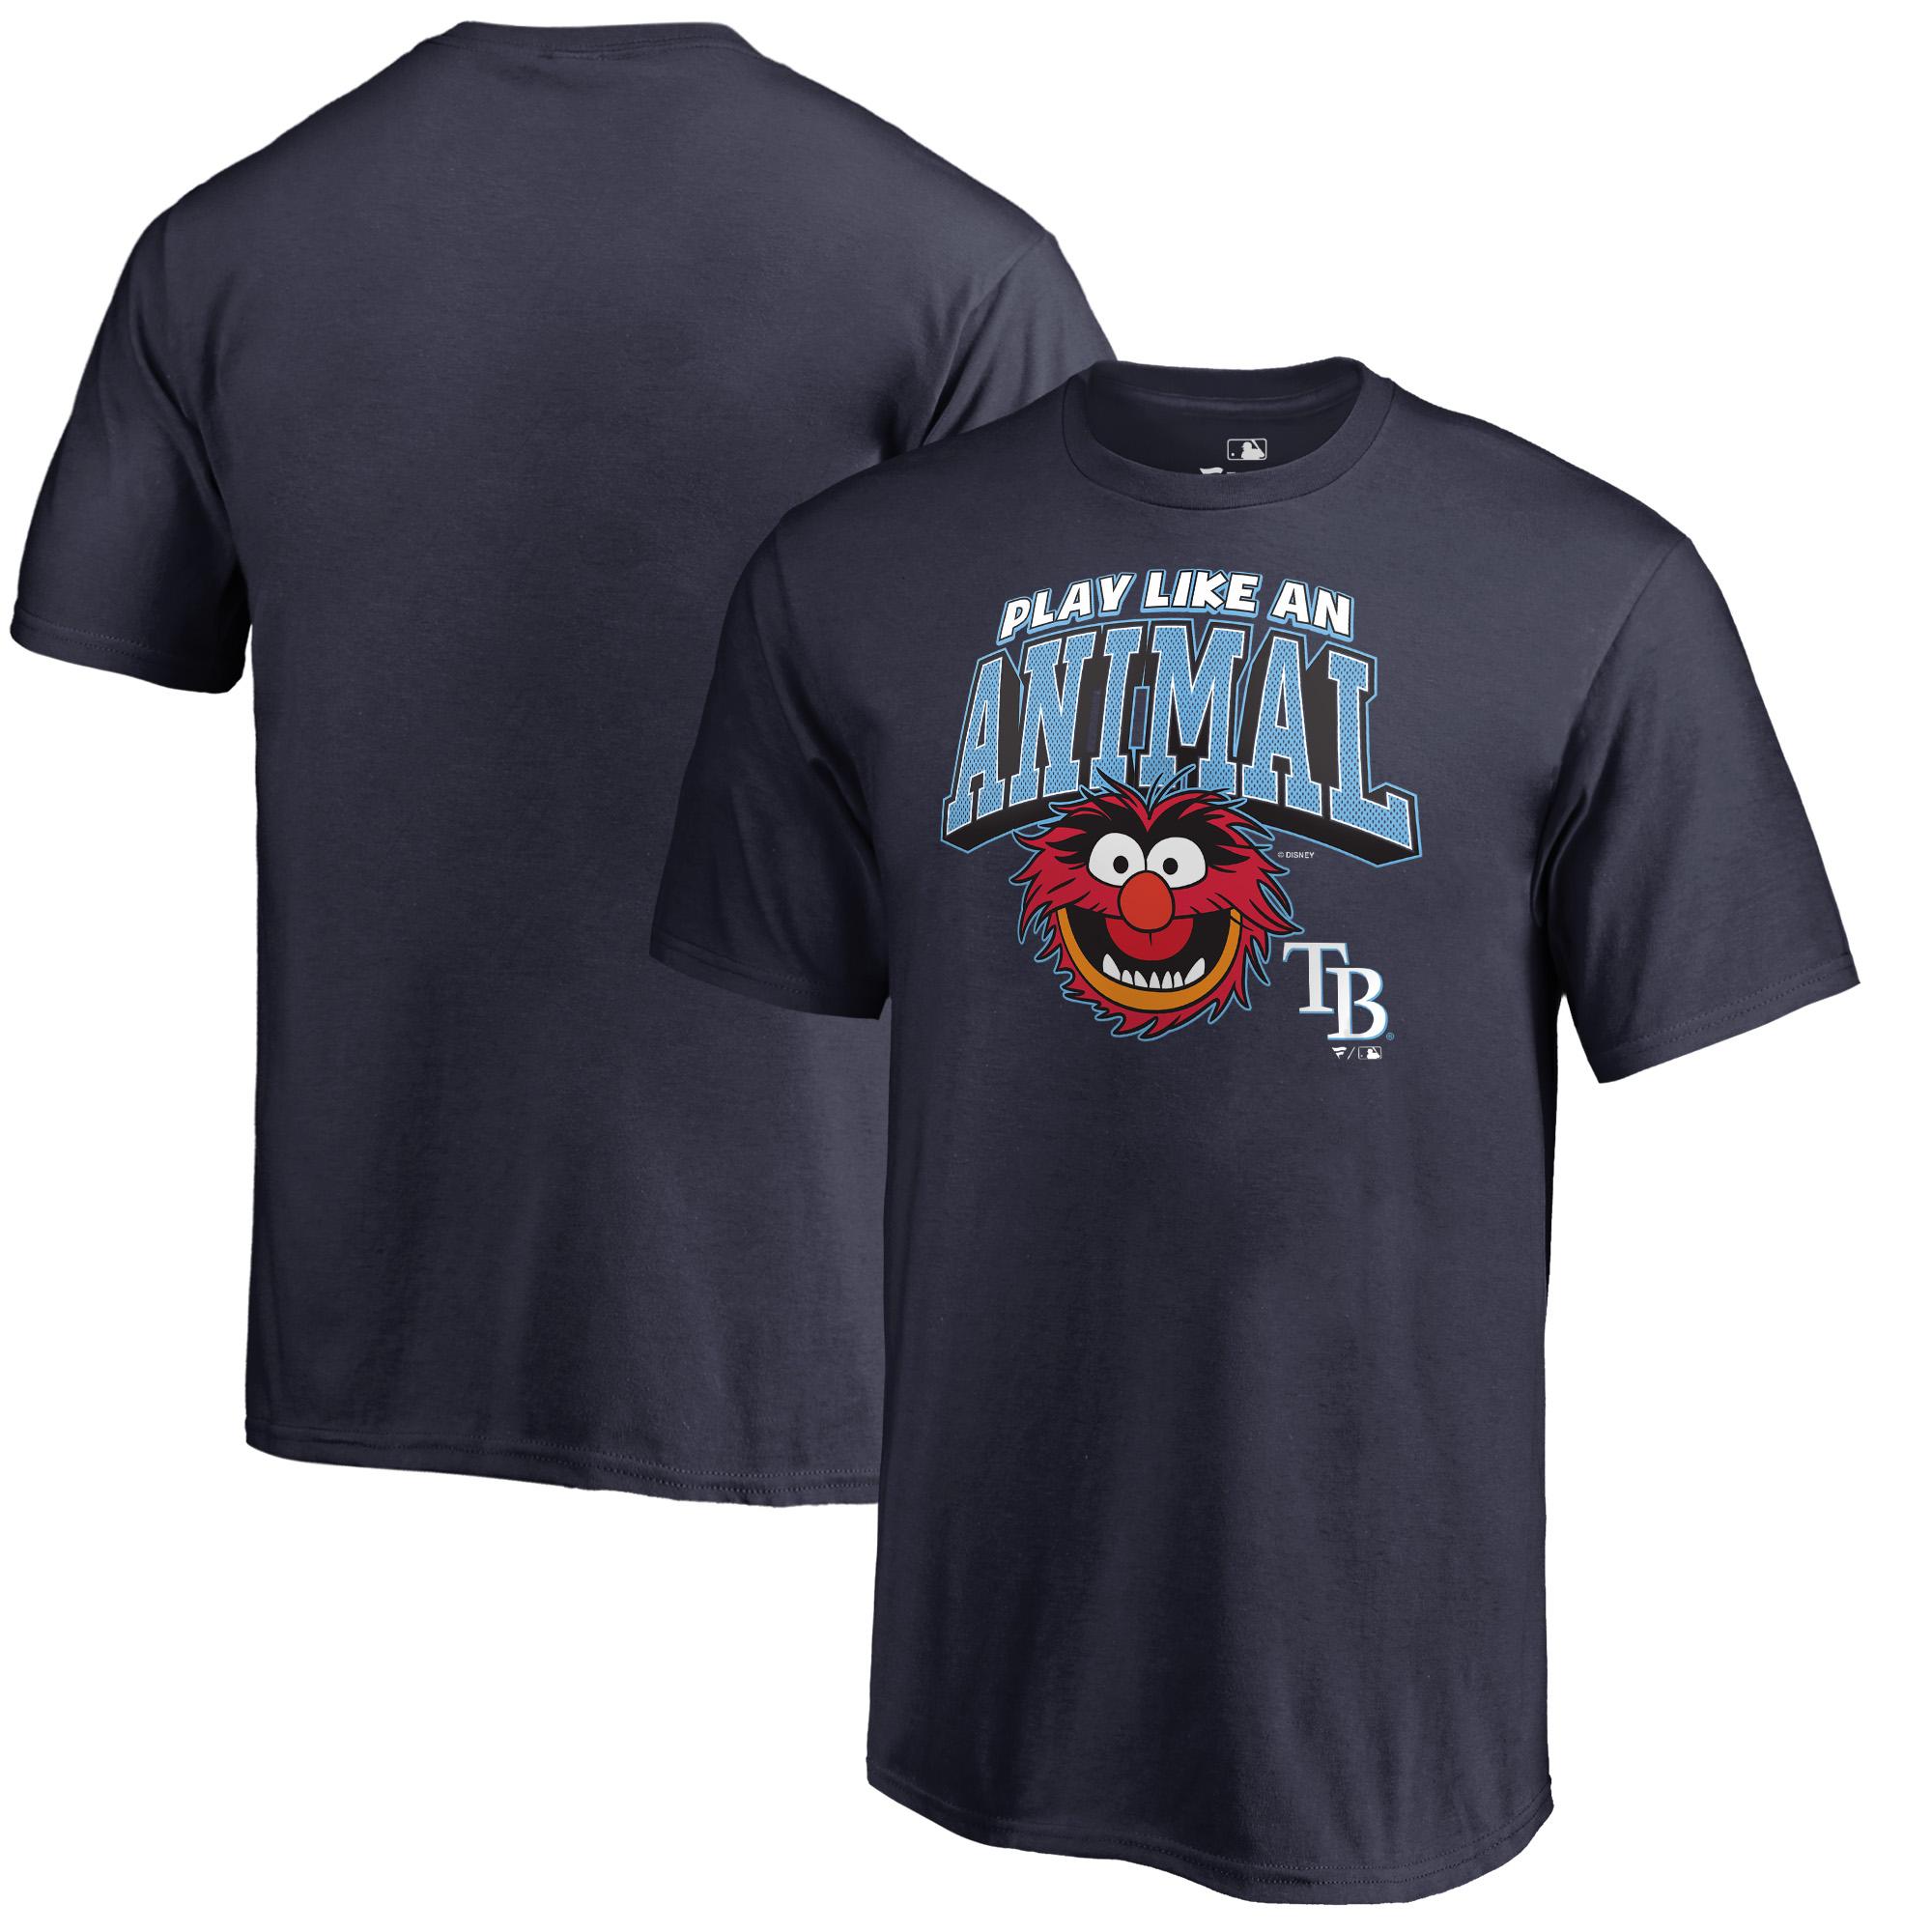 Tampa Bay Rays Fanatics Branded Youth Disney Muppets Play Like an Animal T-Shirt - Navy